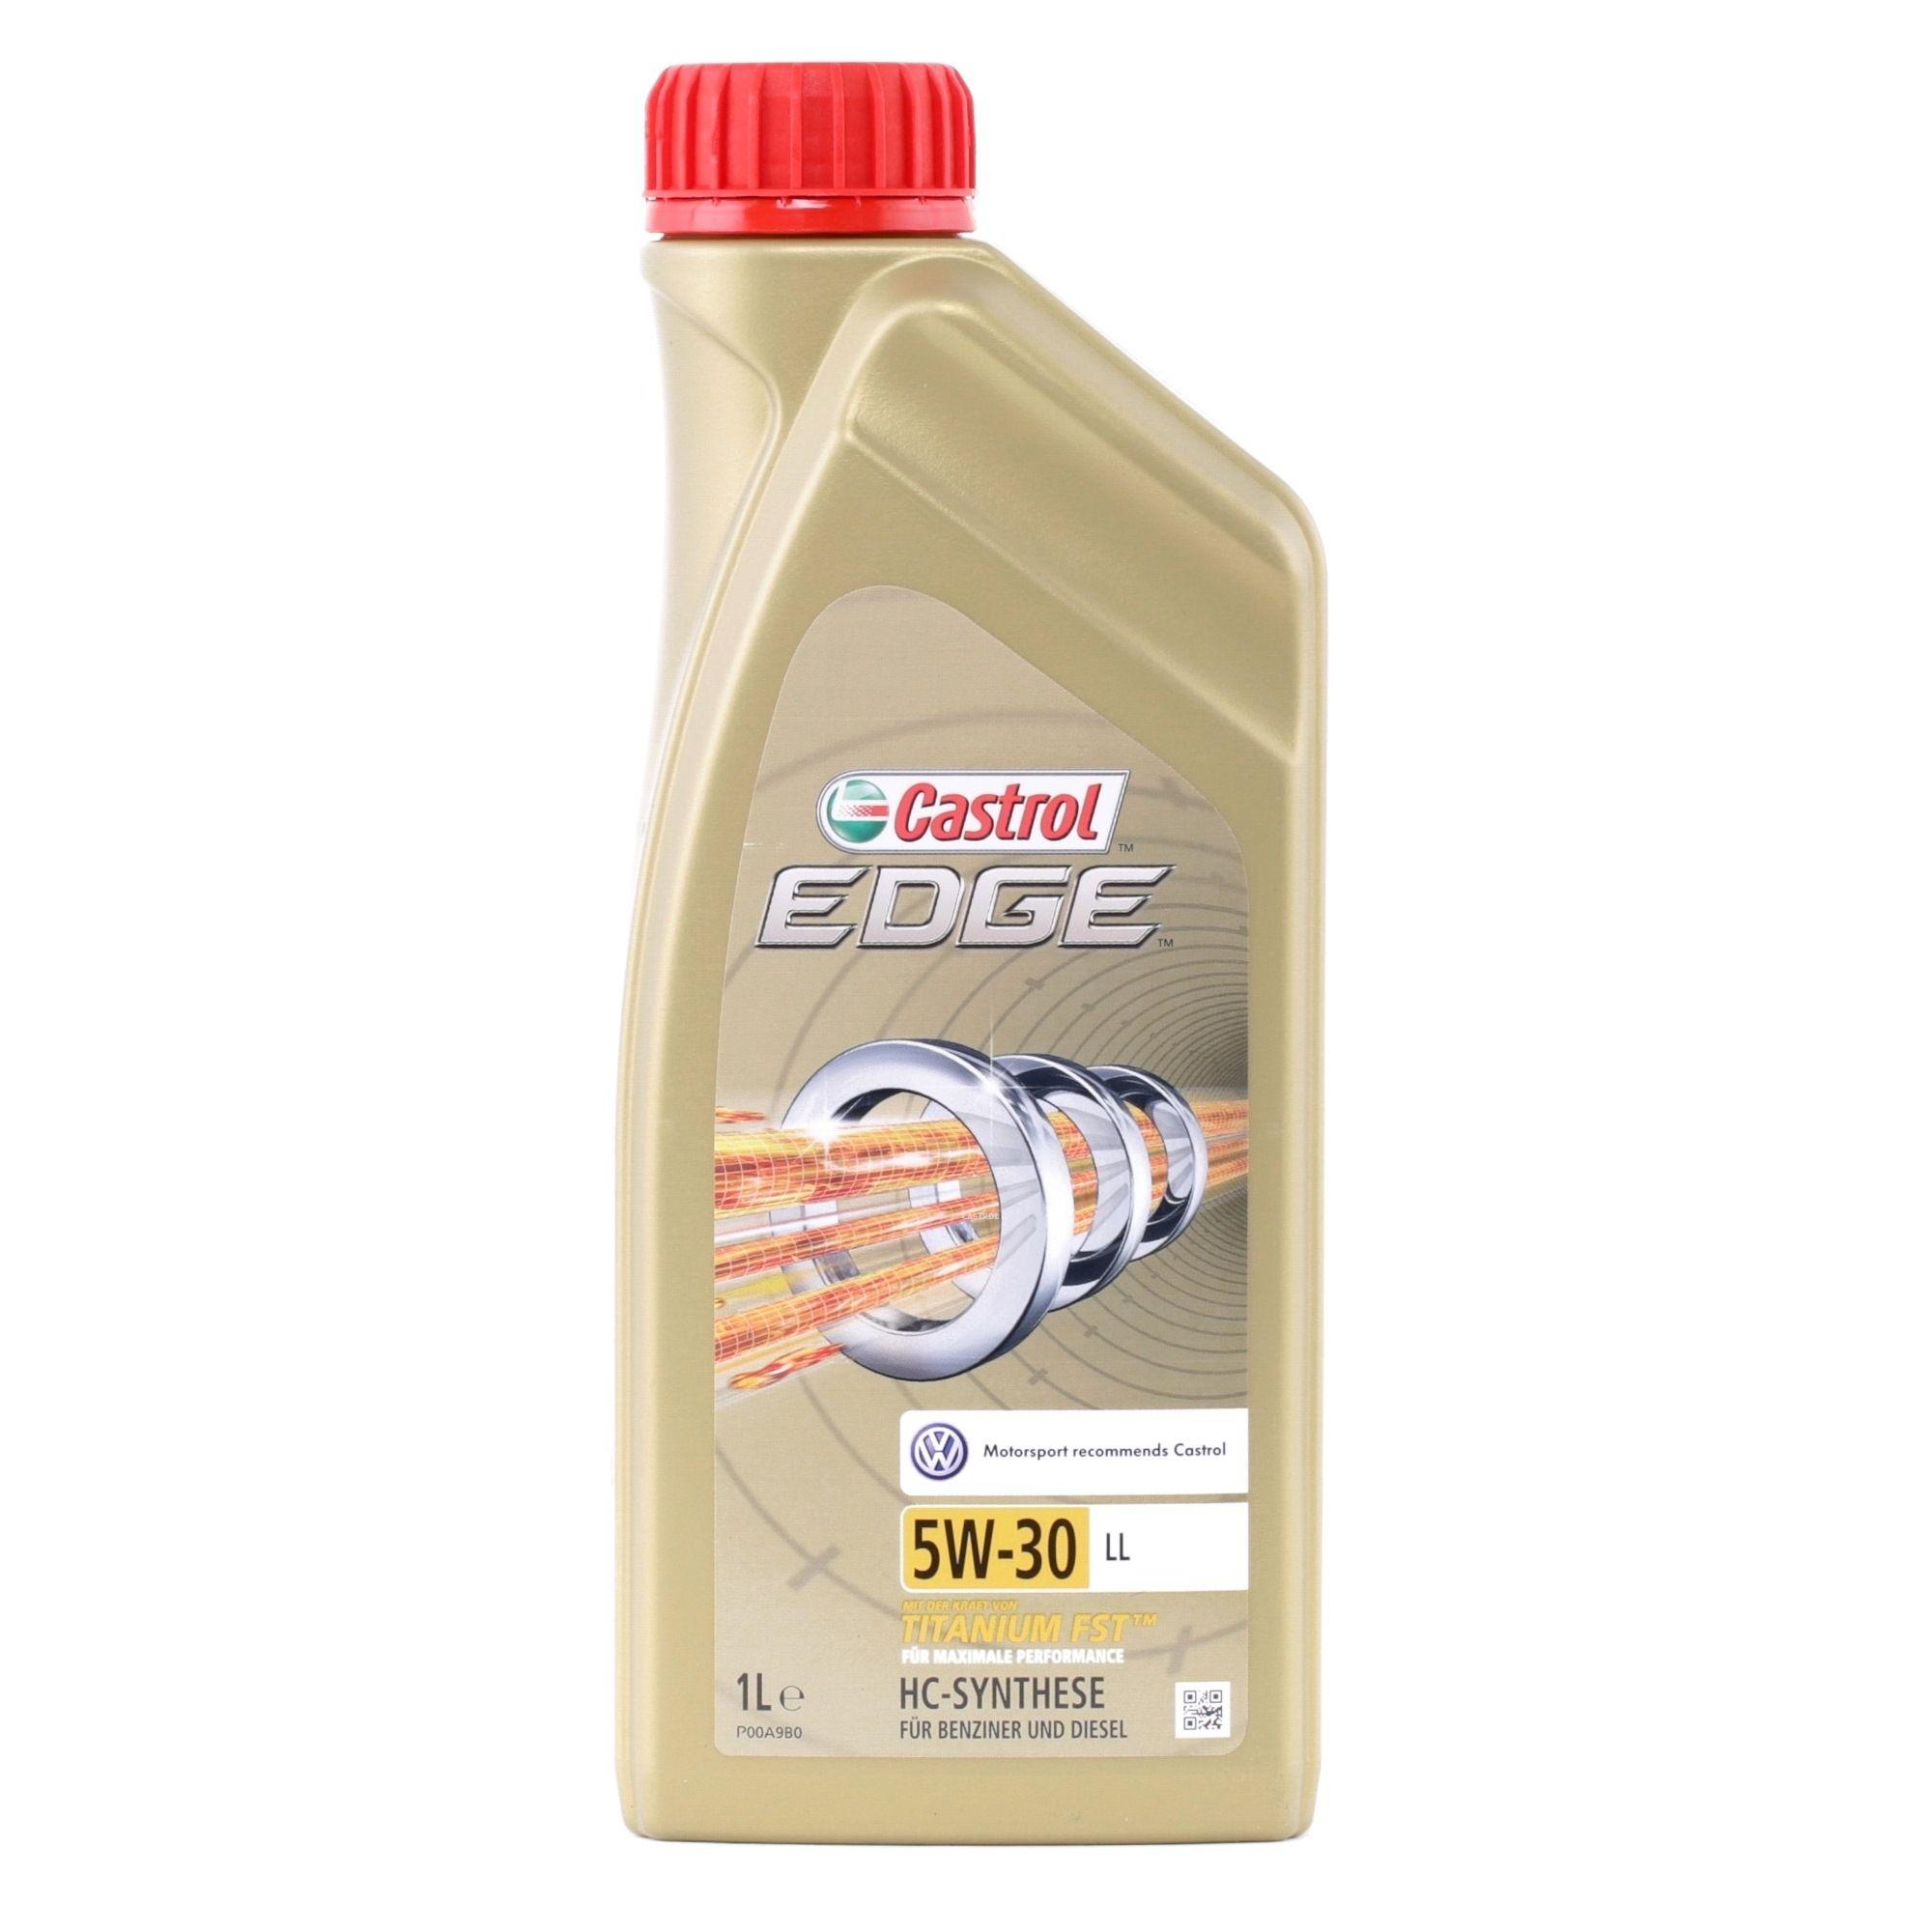 MB2293 CASTROL EDGE, LL 5W-30, 1l, Synthetiköl Motoröl 15665F günstig kaufen